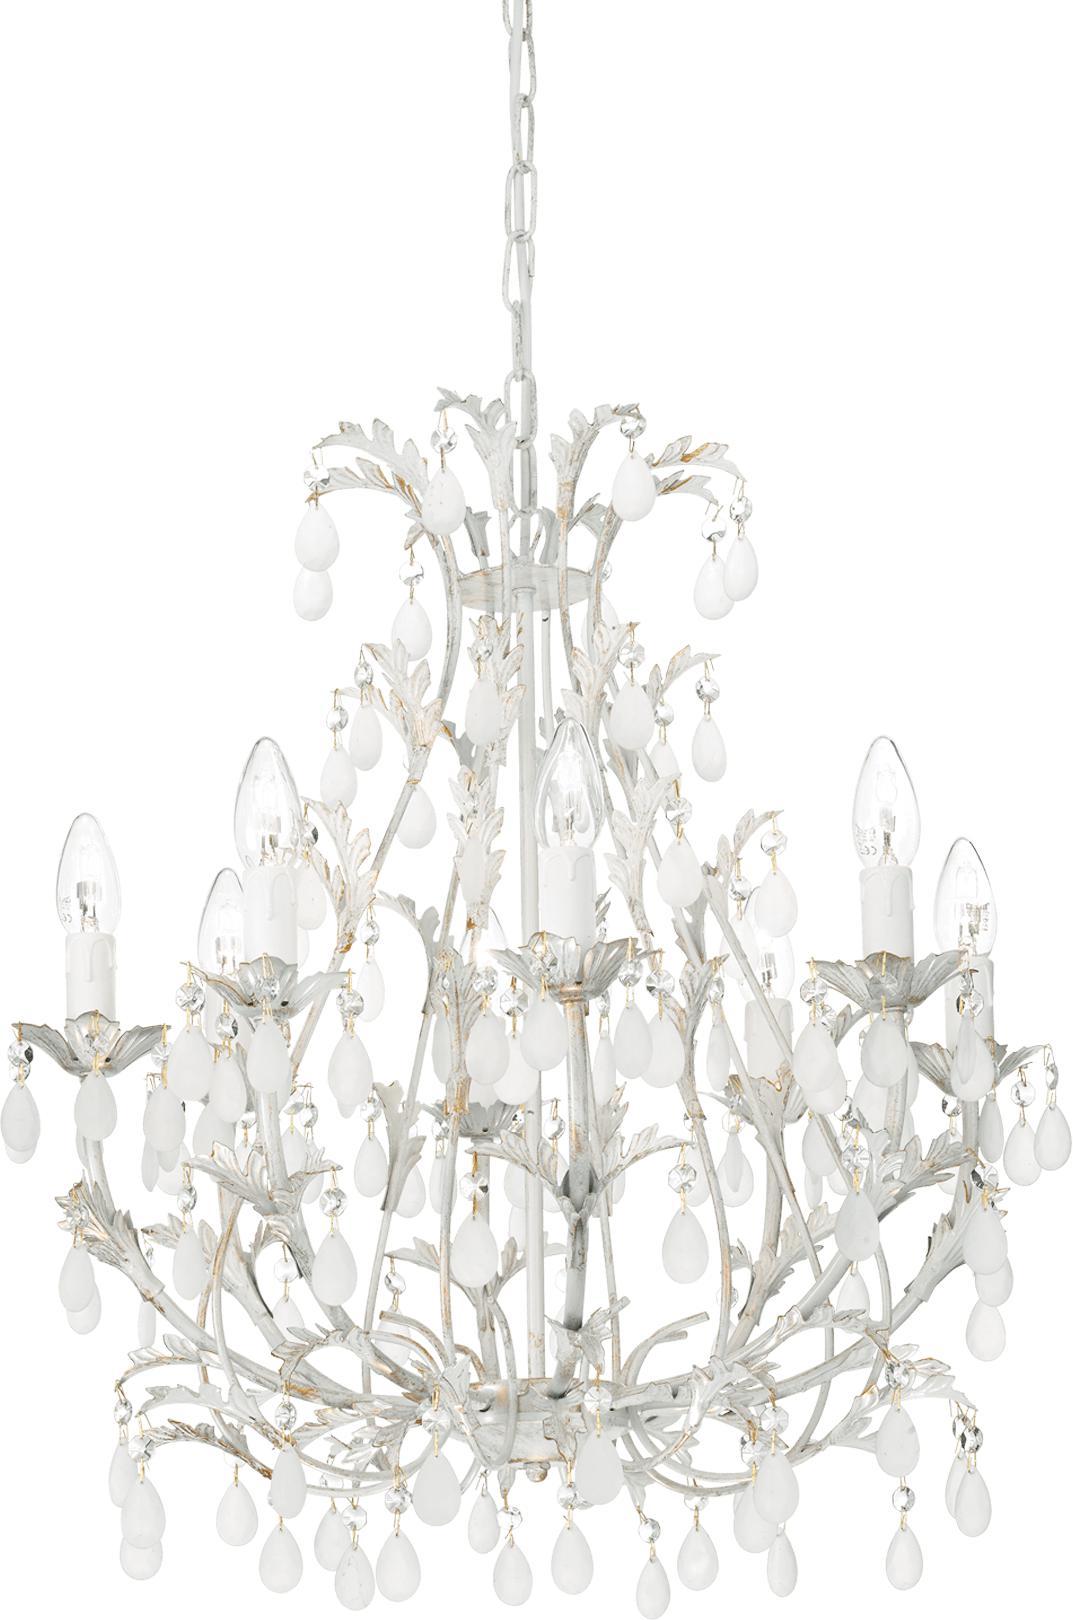 Ideal lux LED Cascina Kronleuchter 8x5W 100289